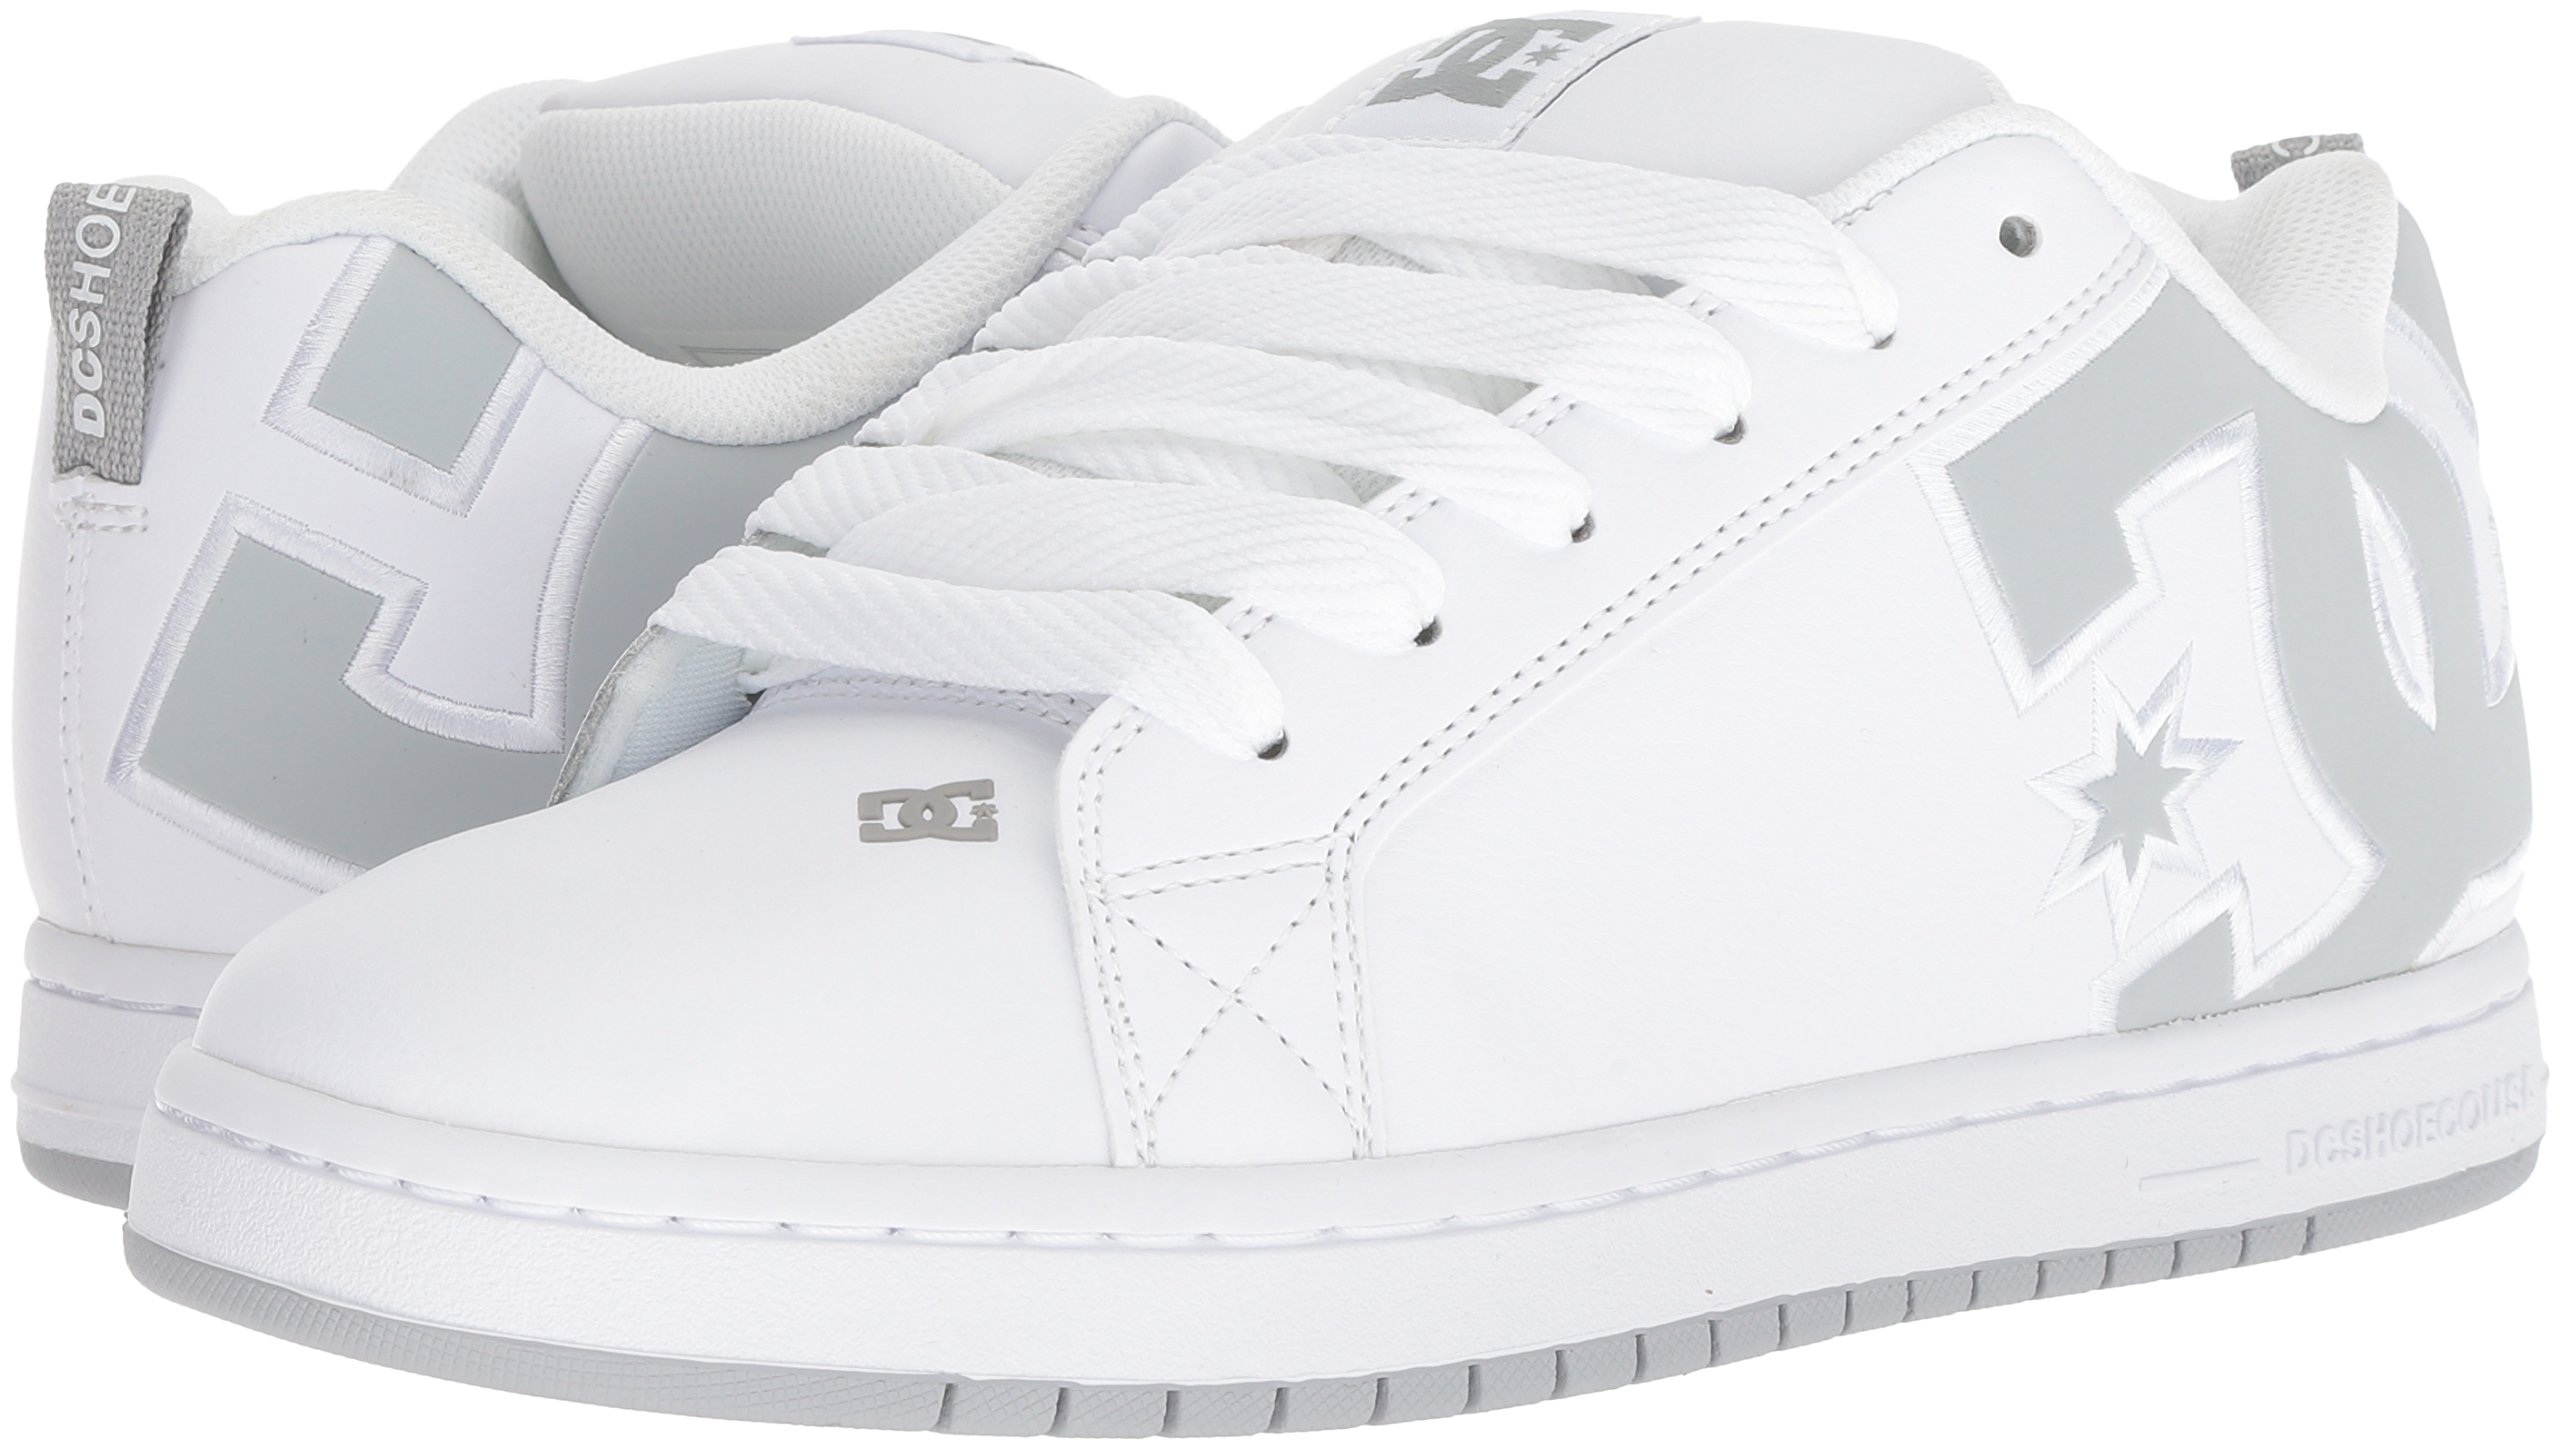 DC Men's Court Graffik SE Skate Shoe White Grey, 15 Medium US by DC (Image #5)